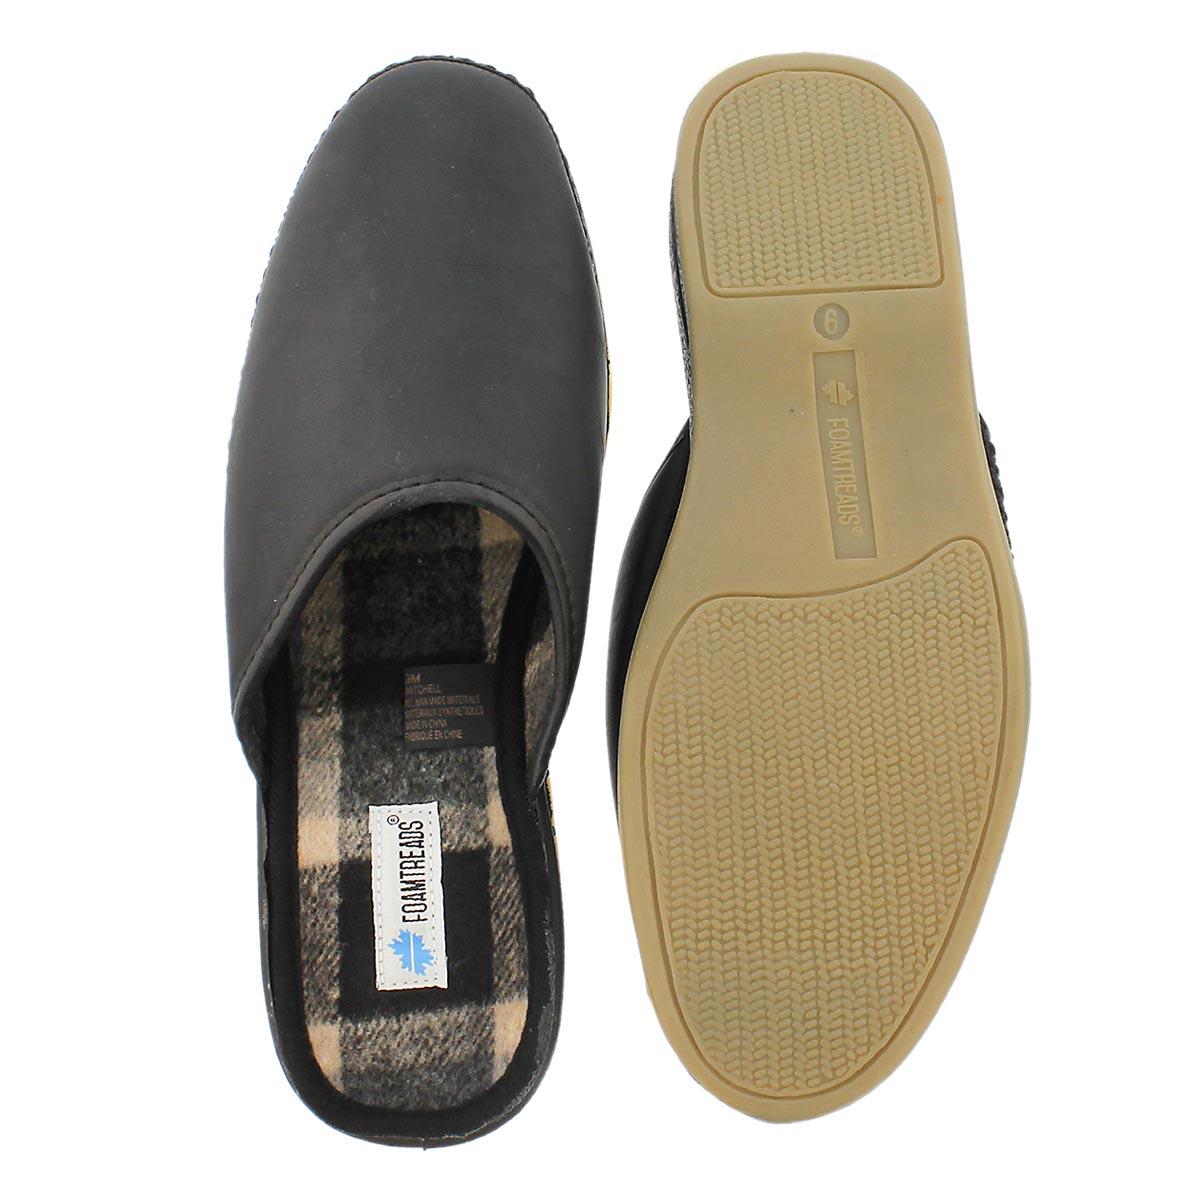 Mns Mitchell black open back slipper